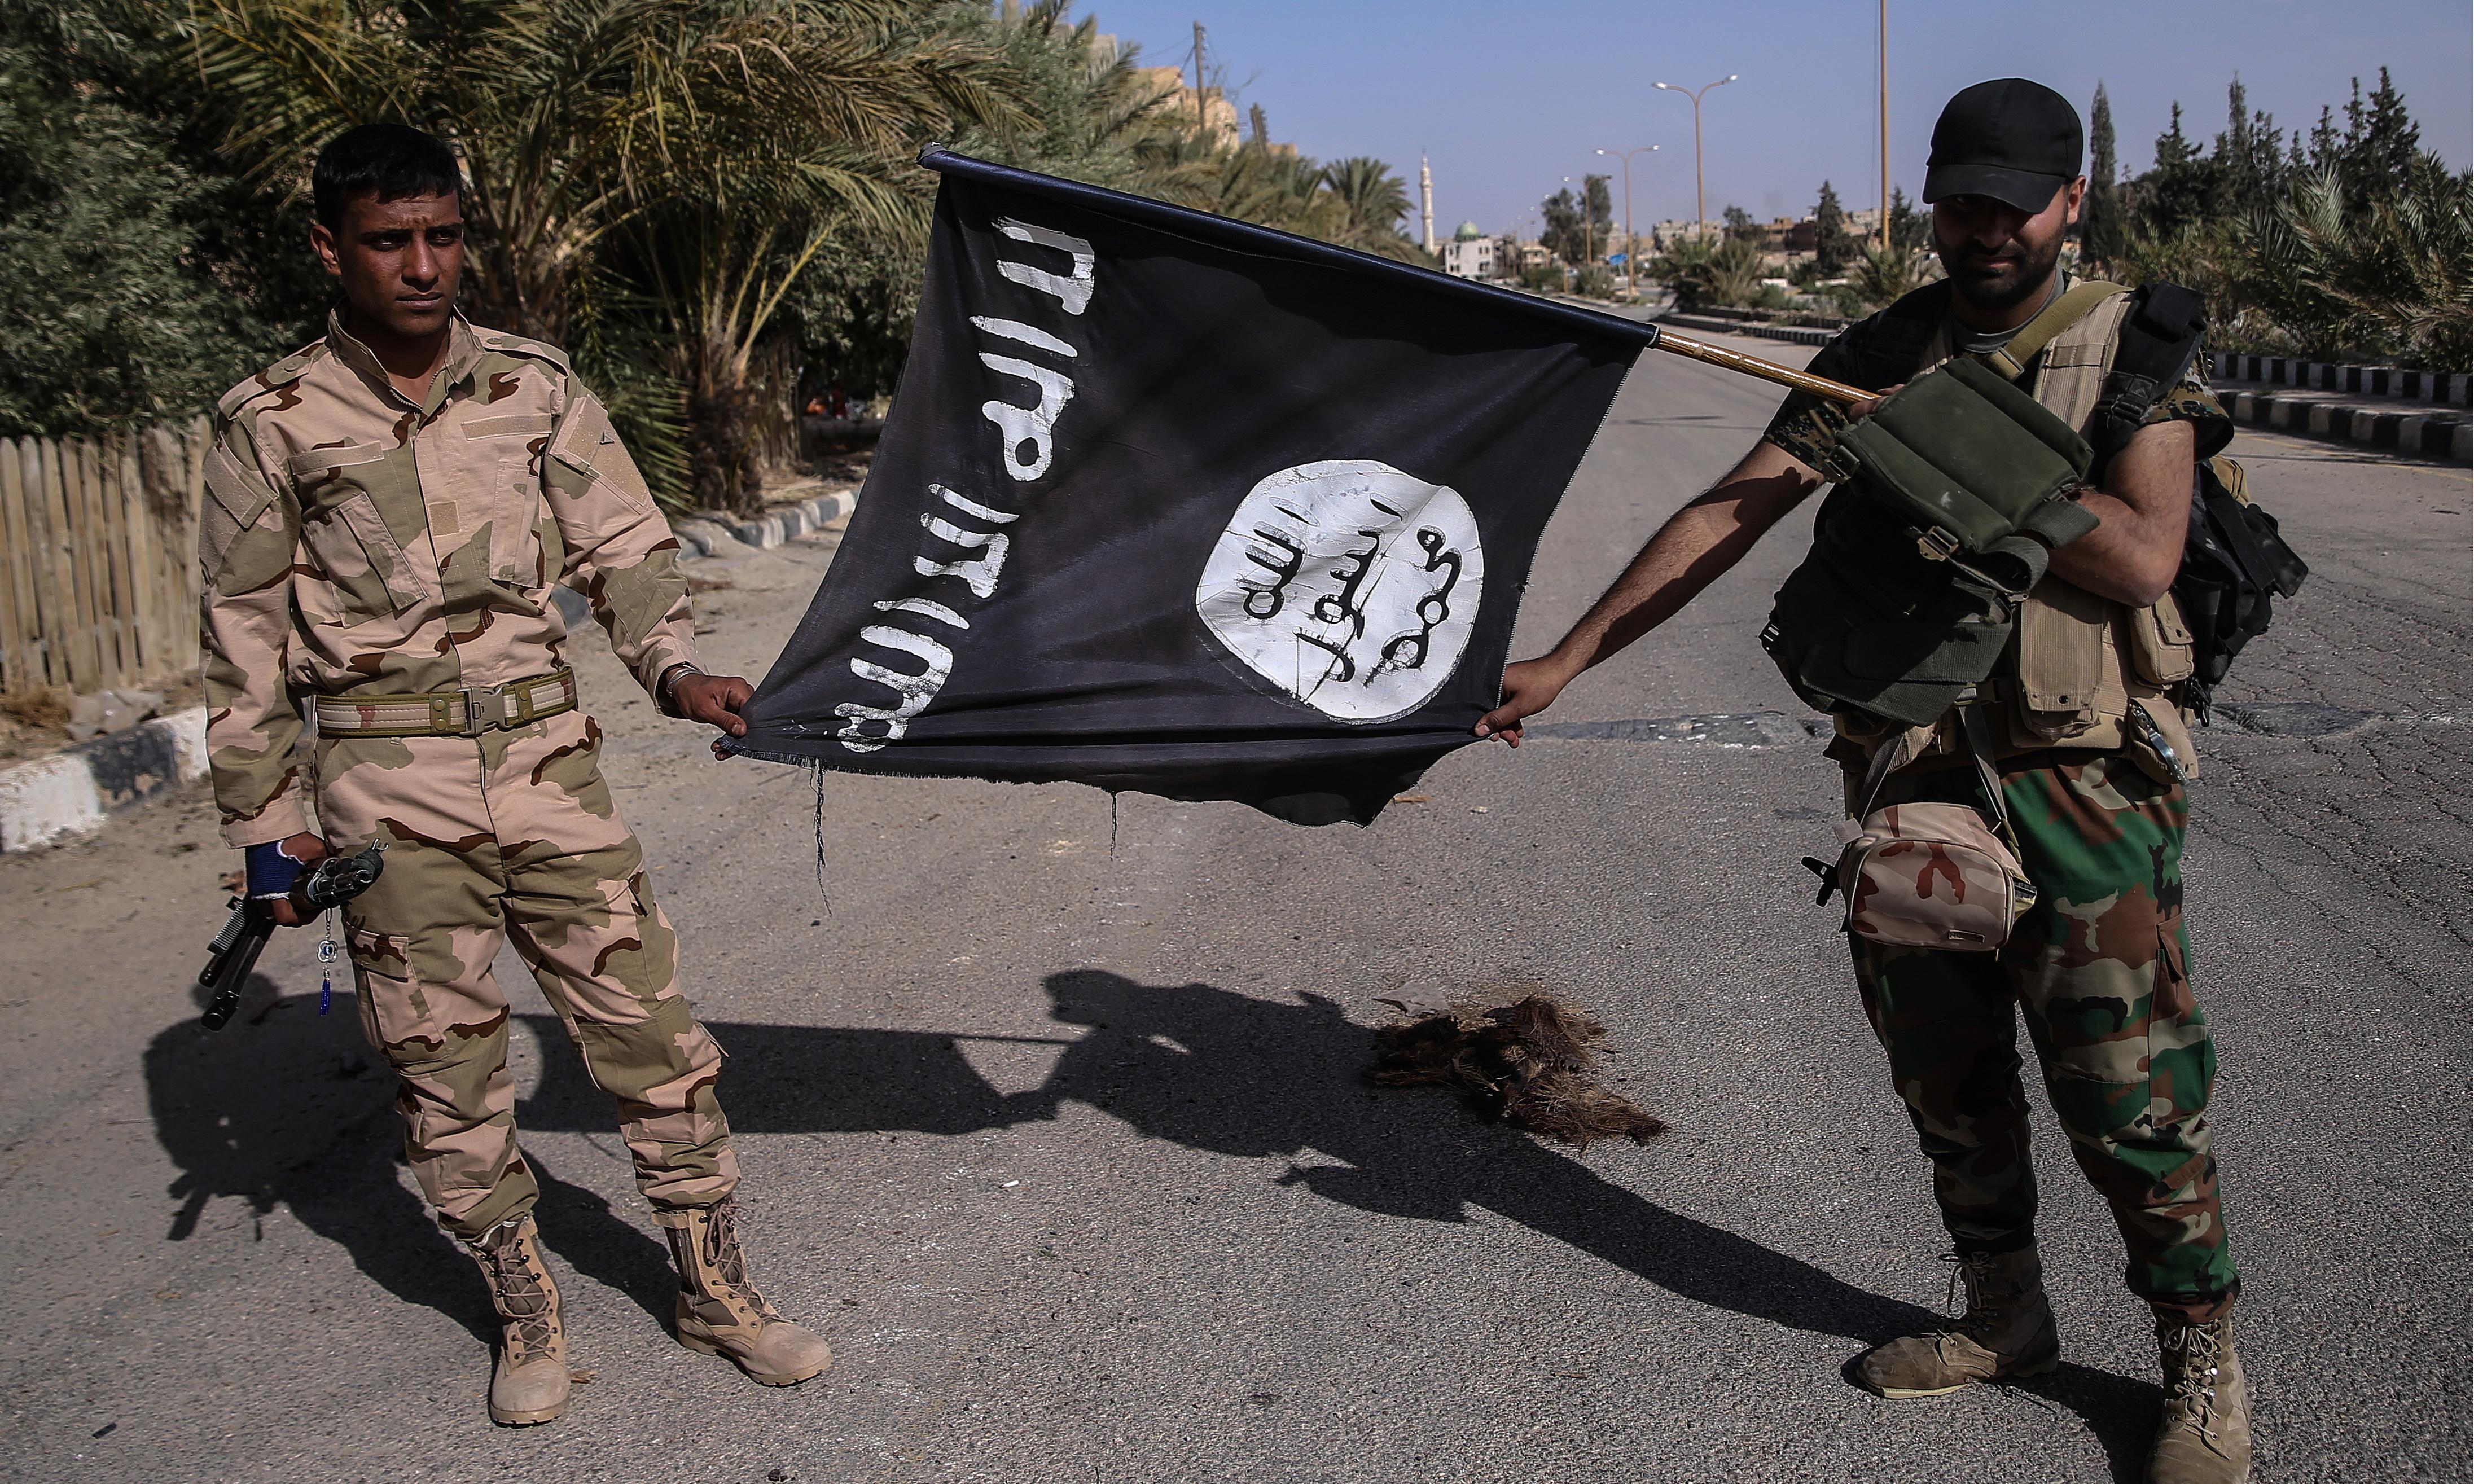 Returning jihadists 'threaten new wave of terror in Europe'